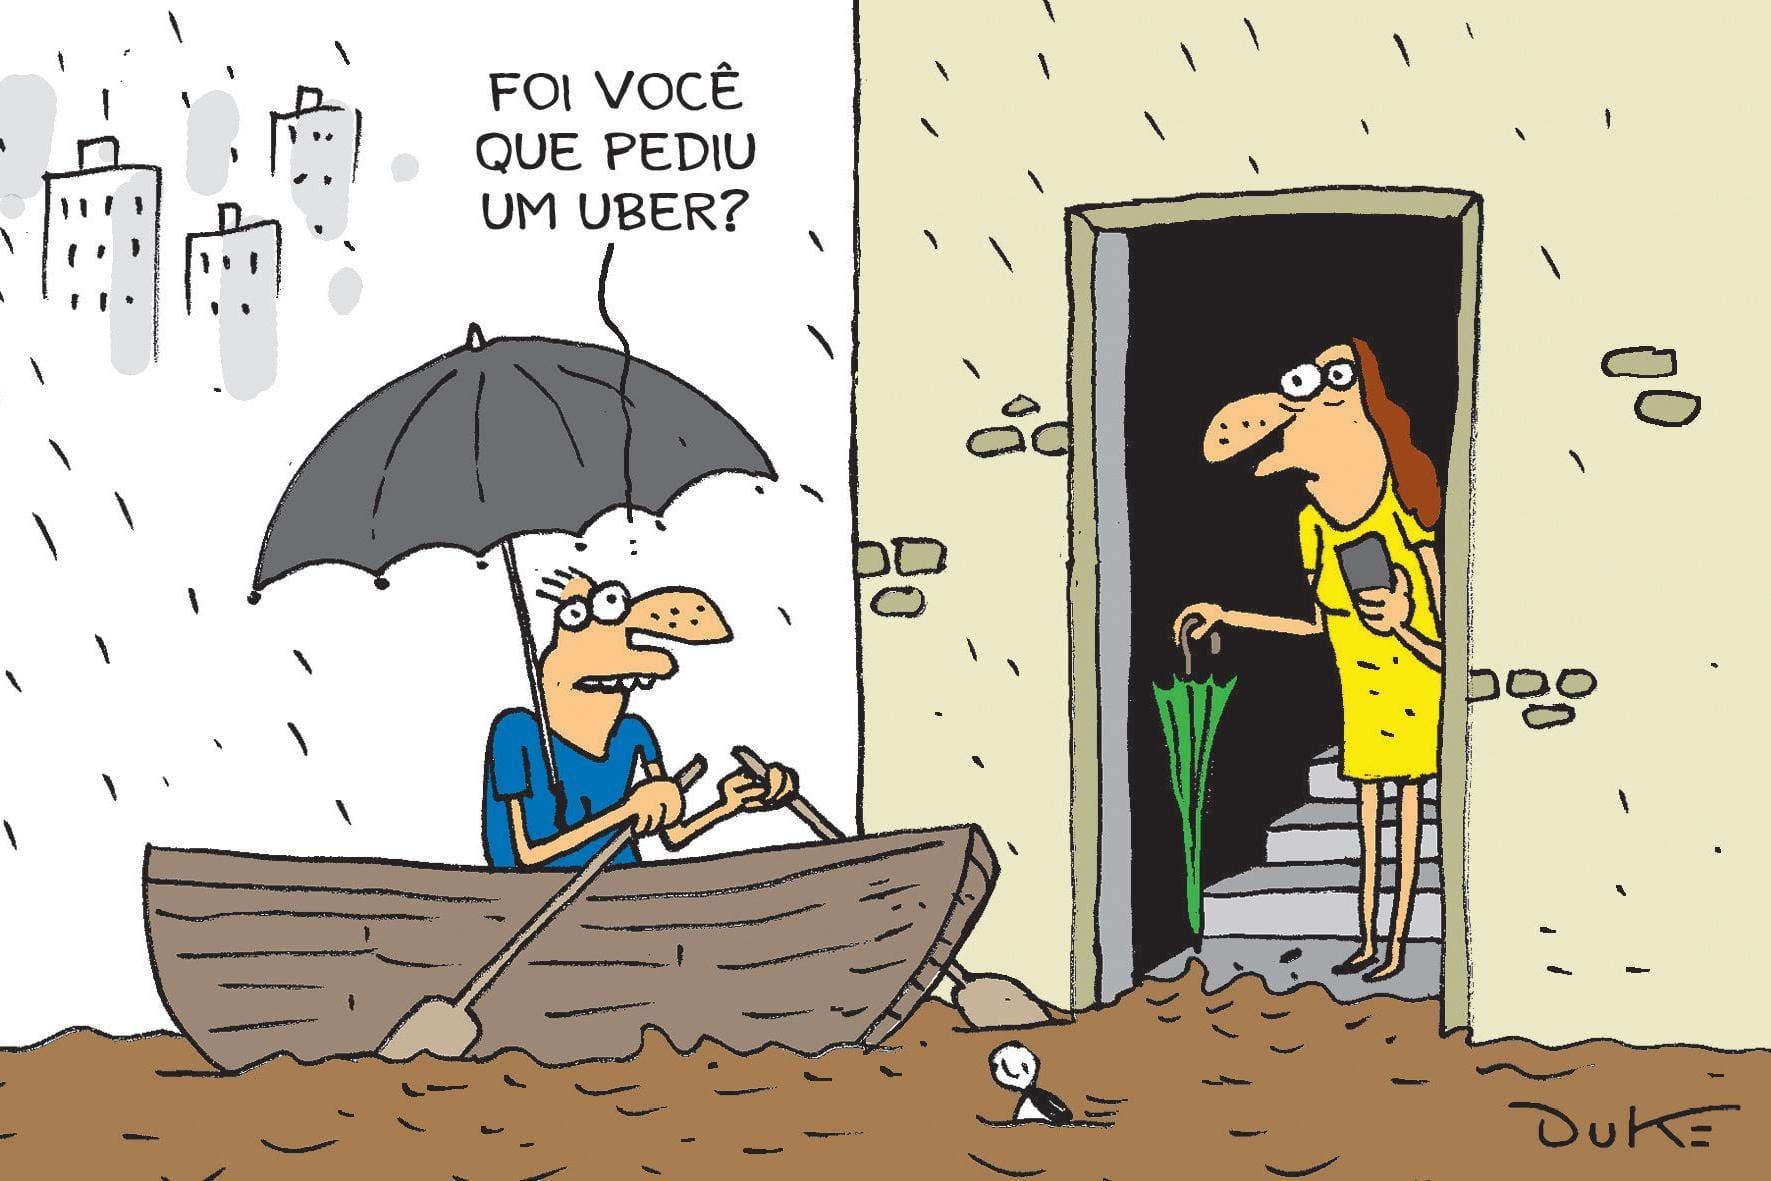 Charge O Tempo 08/12/2018